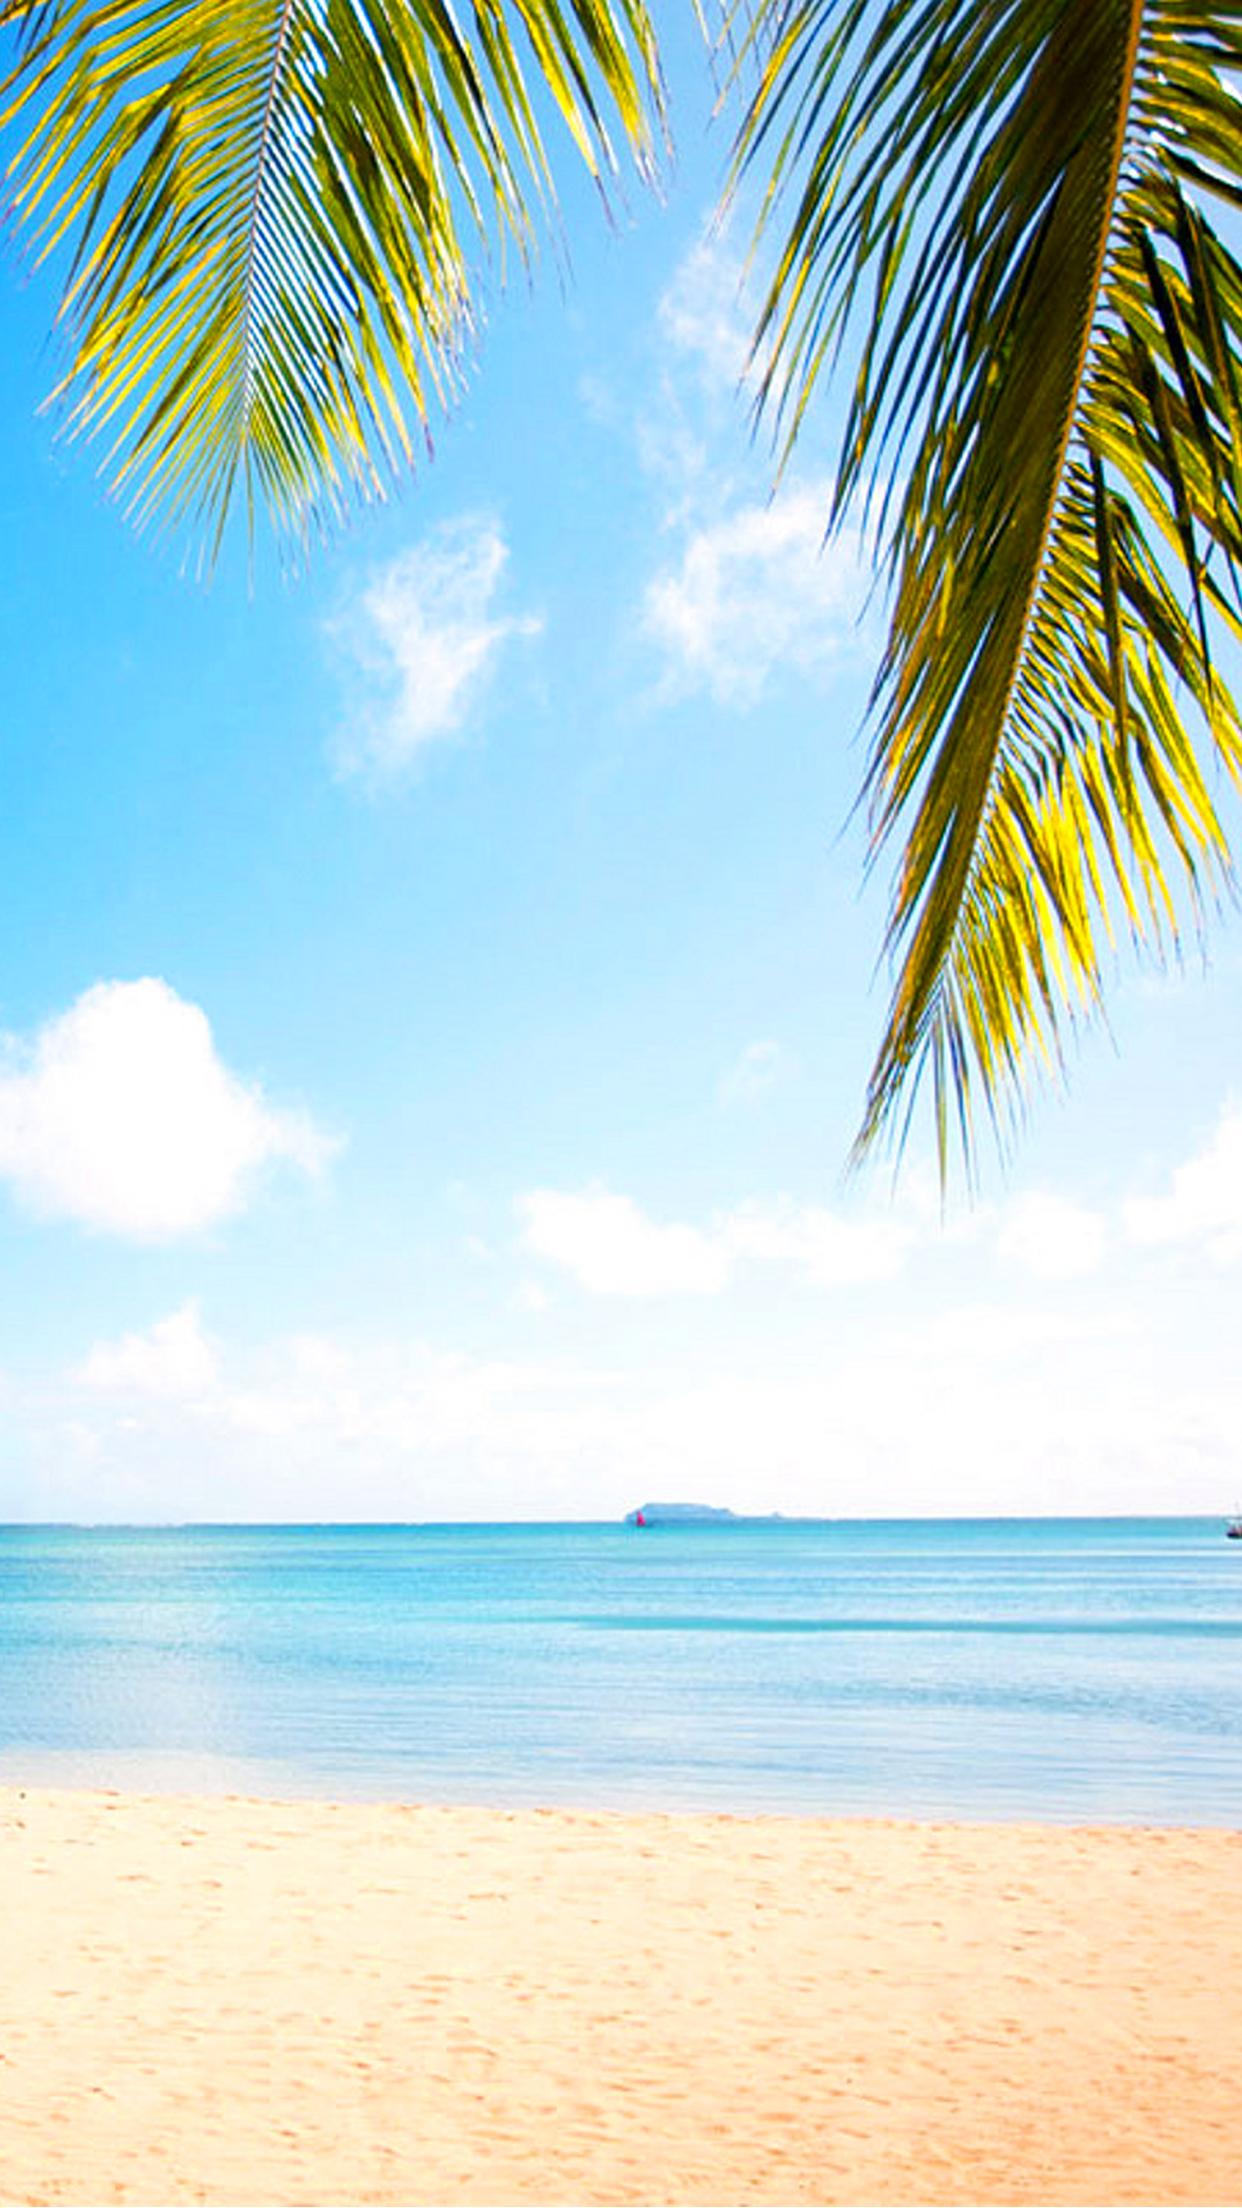 Mauritius beach paradise 3Wallpapers iPhone Parallax Mauritius beach paradise